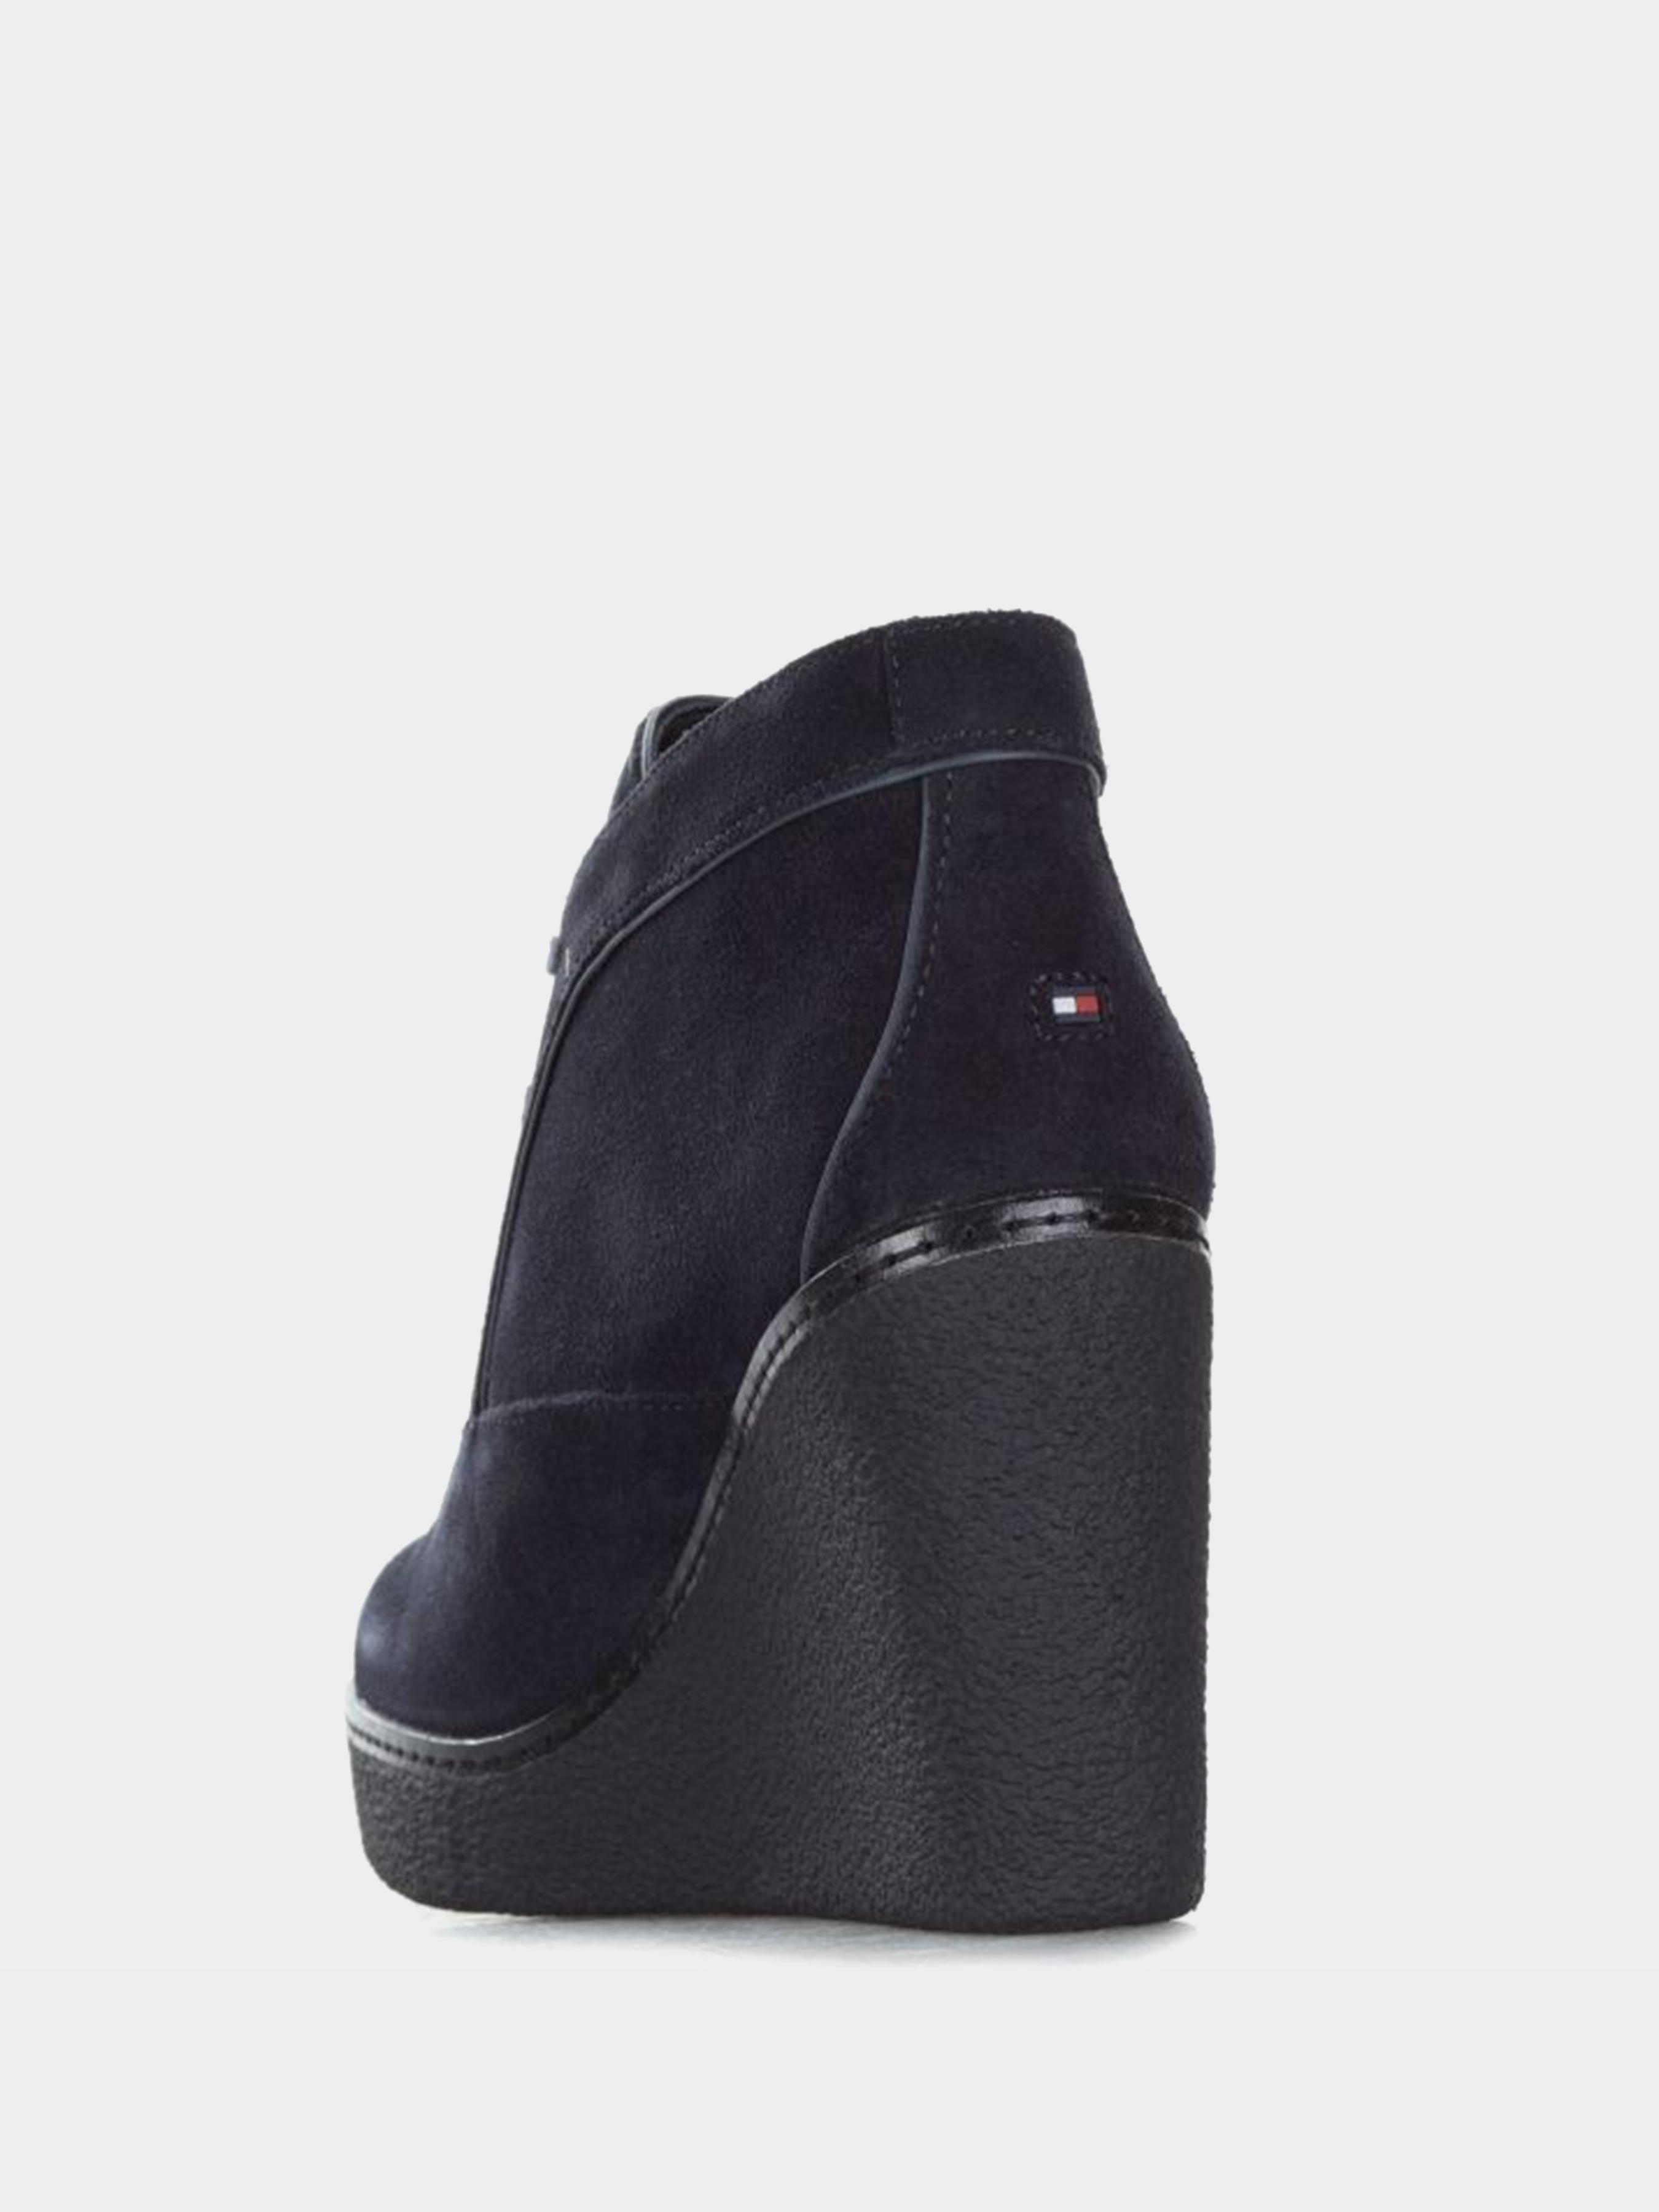 Ботинки женские Tommy Hilfiger TD1162 , 2017